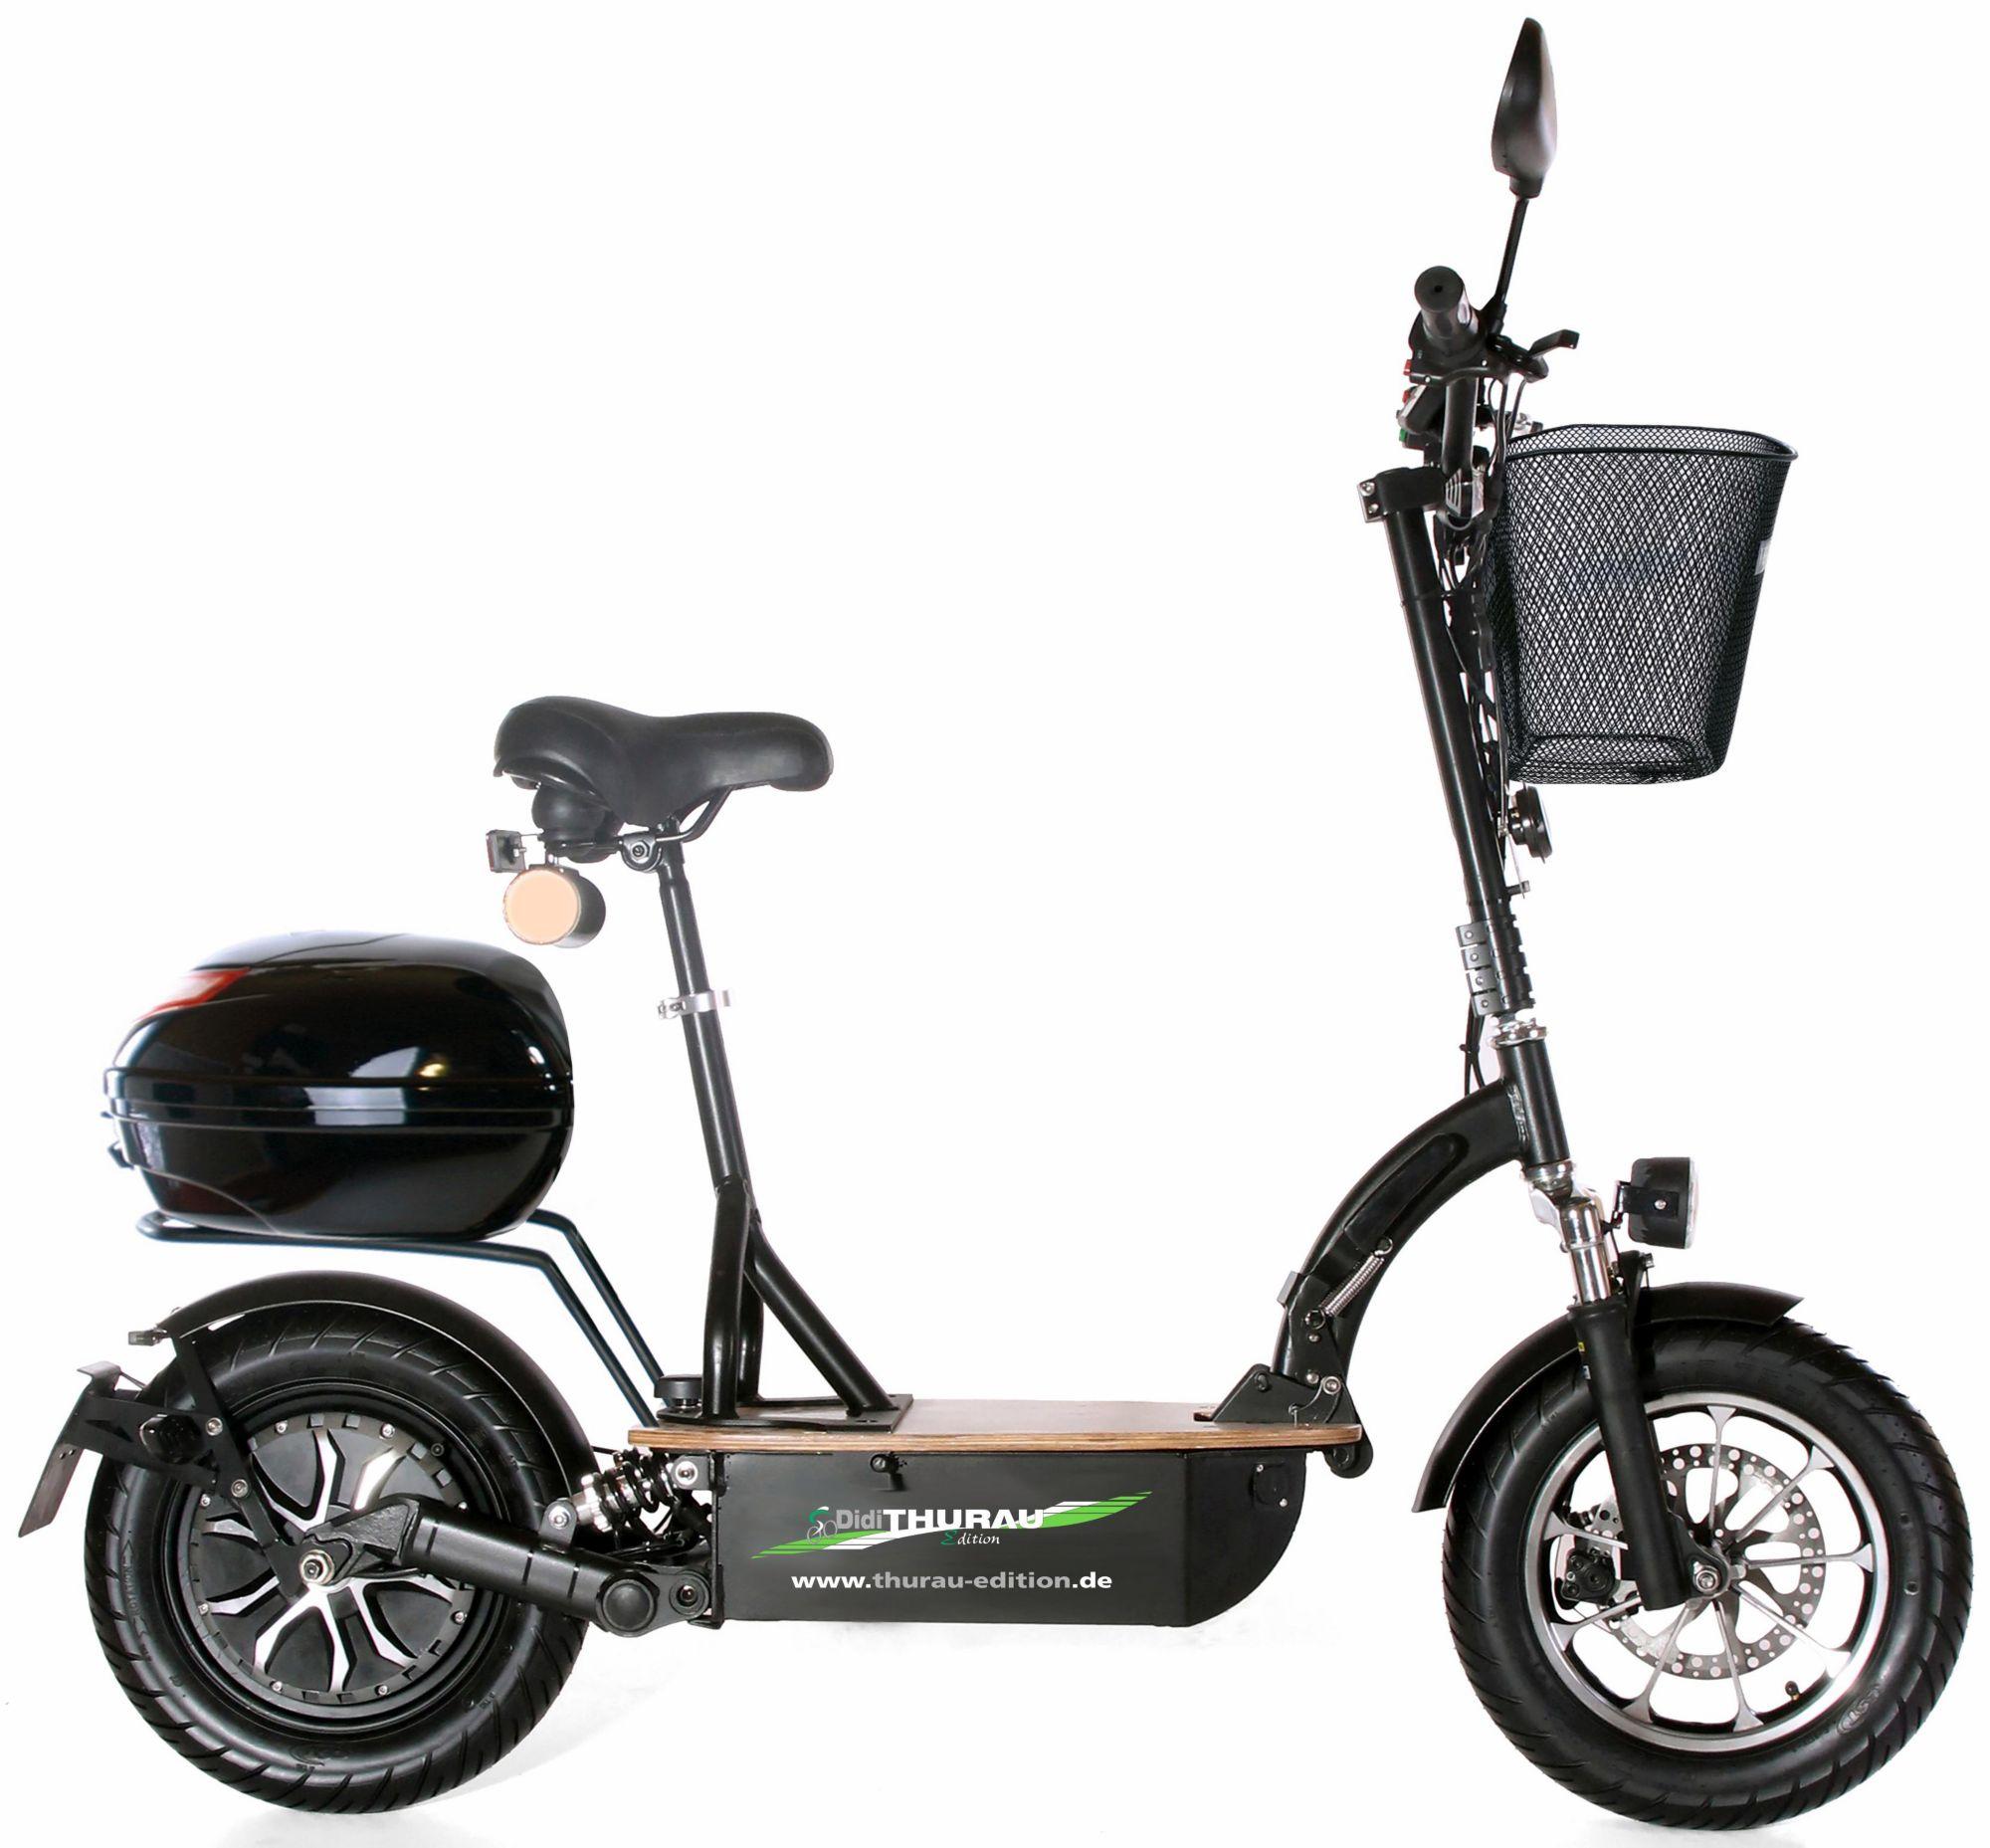 DIDI THURAU EDITION Didi Thurau Edition Elektro-Roller Eco-Tourer, 20 km/h, »Safety«